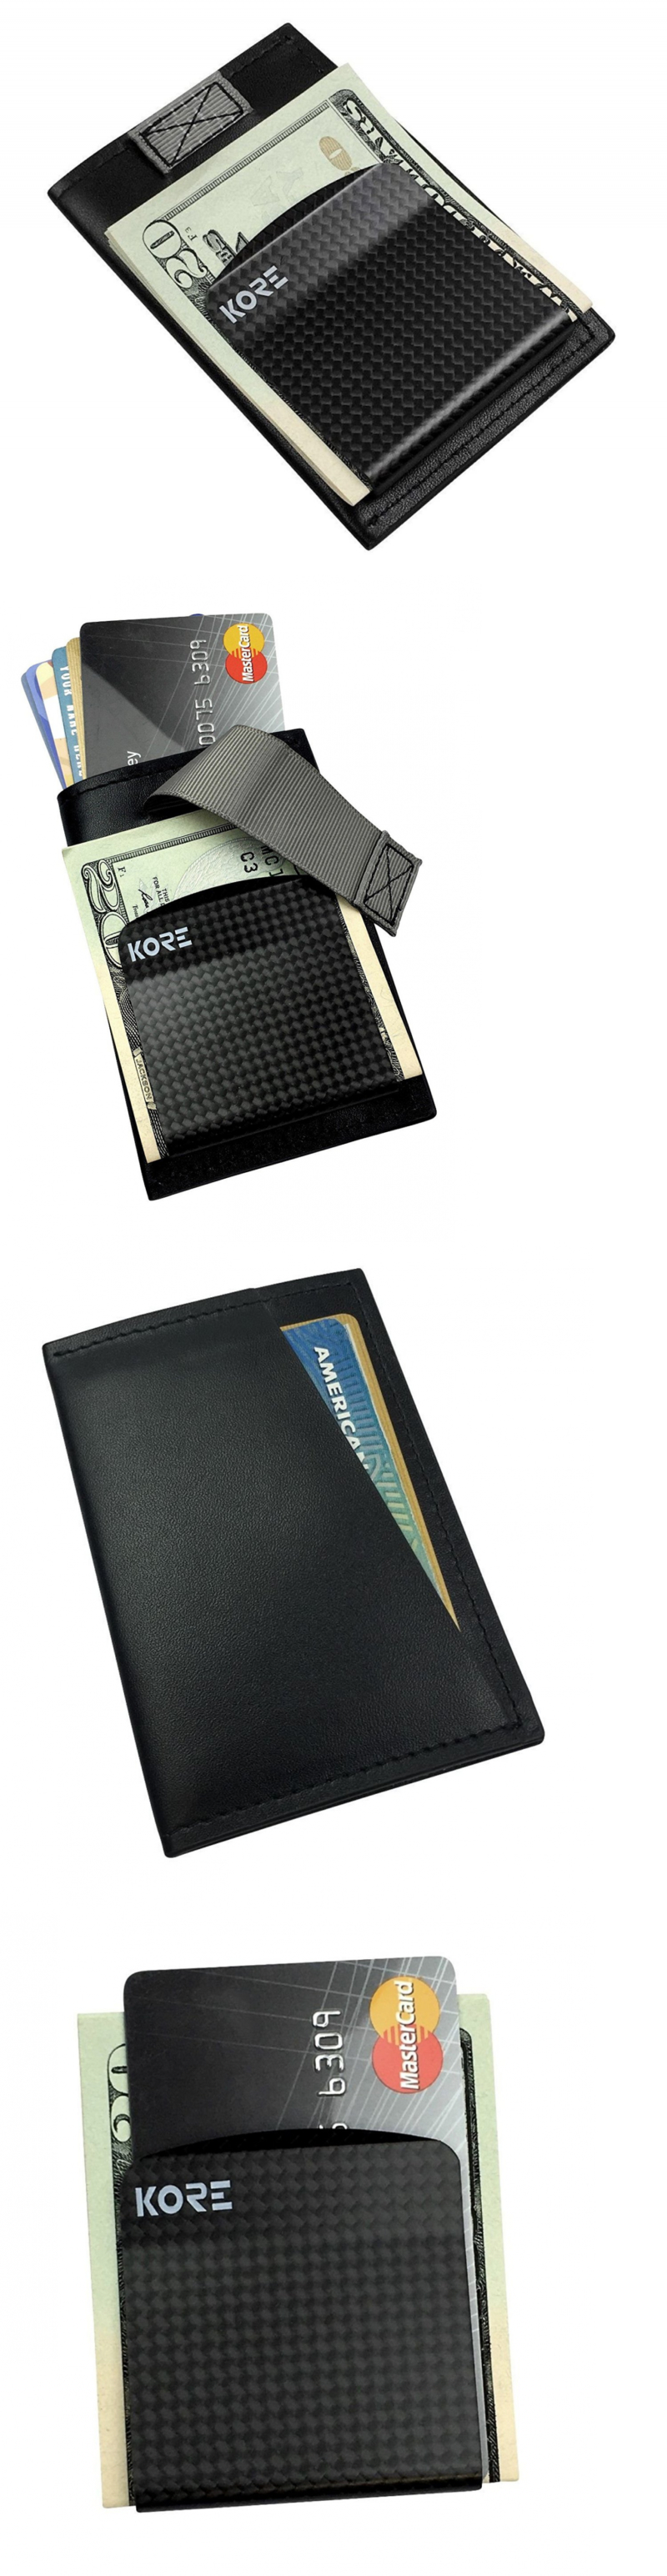 3eb2903b293 Money Clips 163583  Kore Slim Wallet + Carbon Fiber Money Clip  Rfid  Blocking